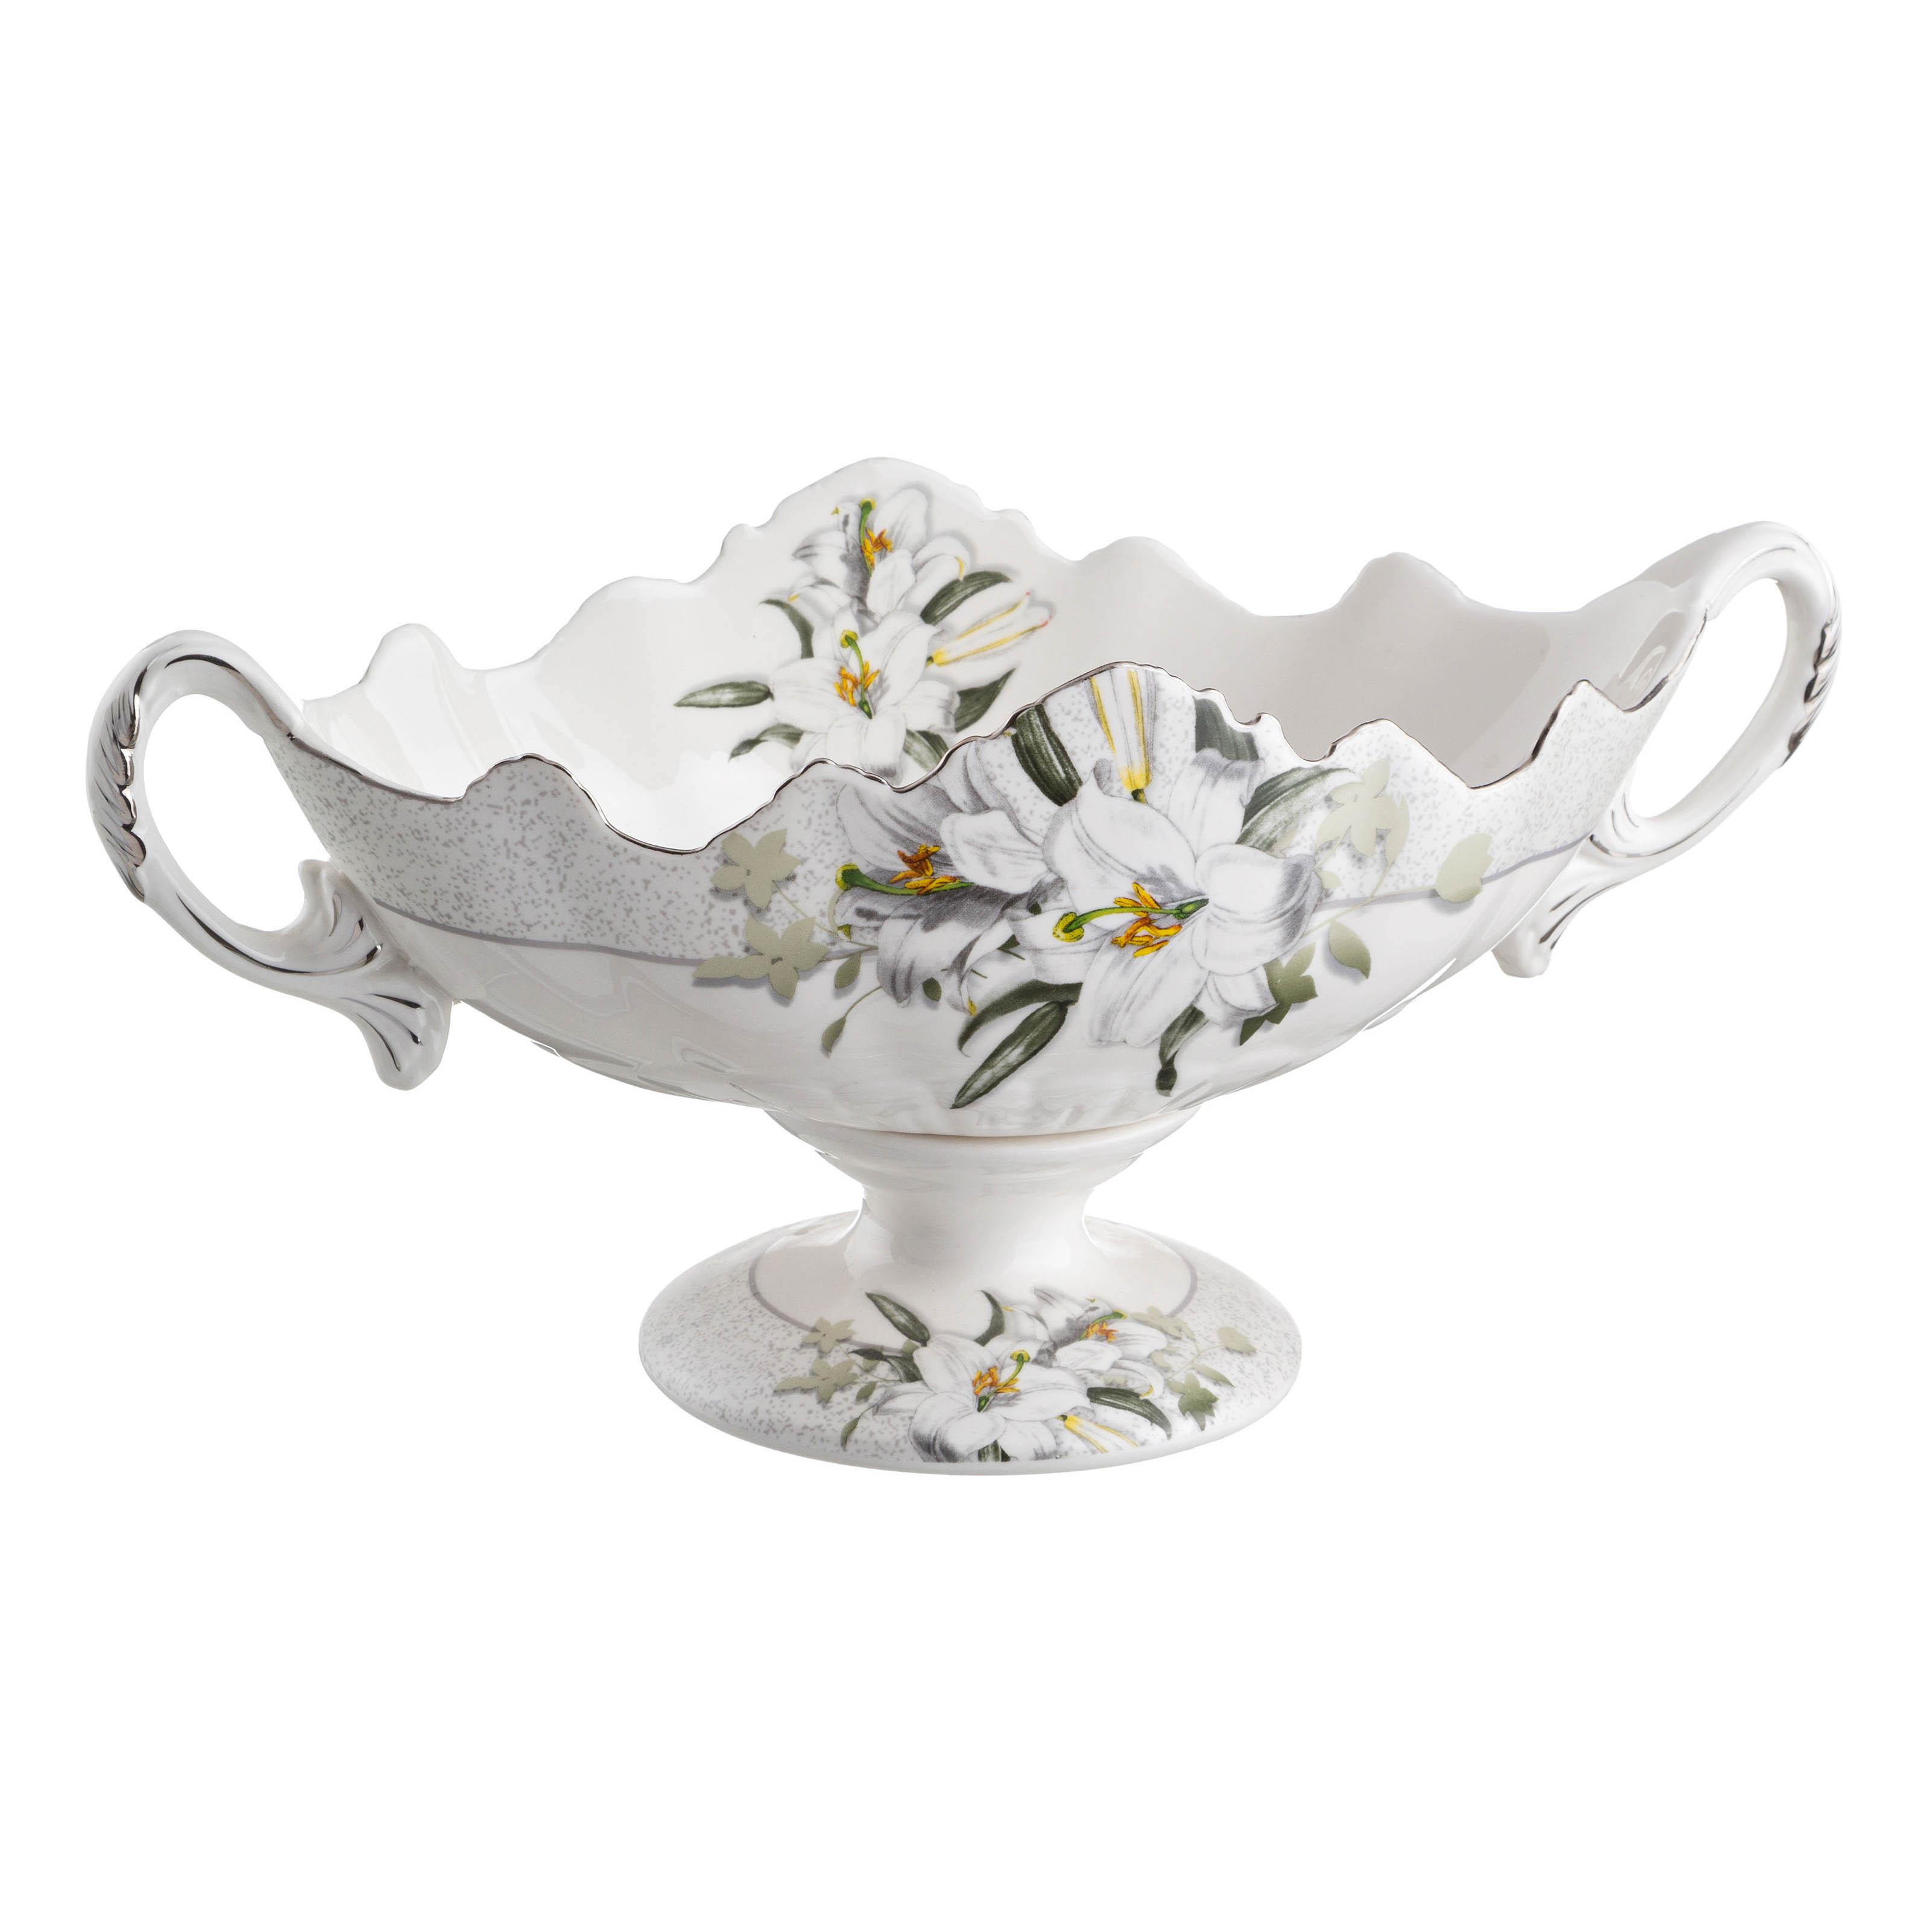 {} Lefard Ваза для фруктов Лилия (13х13х29 см) ваза керамика напольная 60 см цветущая лилия 1044984